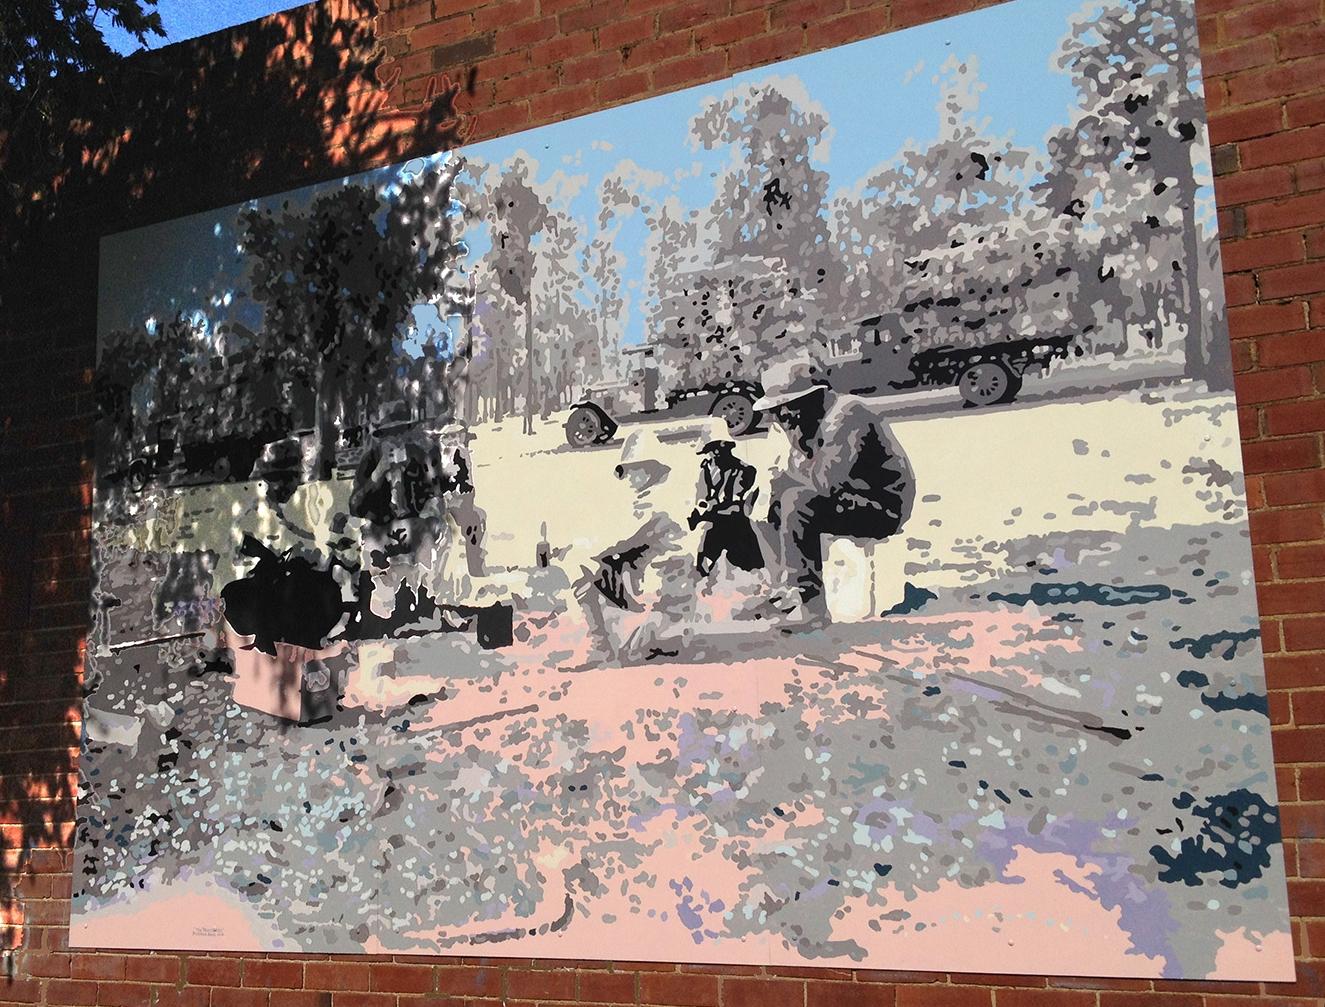 Jack Randell ' The Travellers ' Public Mural Trangie NSW.  Acrylic on aluminium  240x3 60 cm 2018